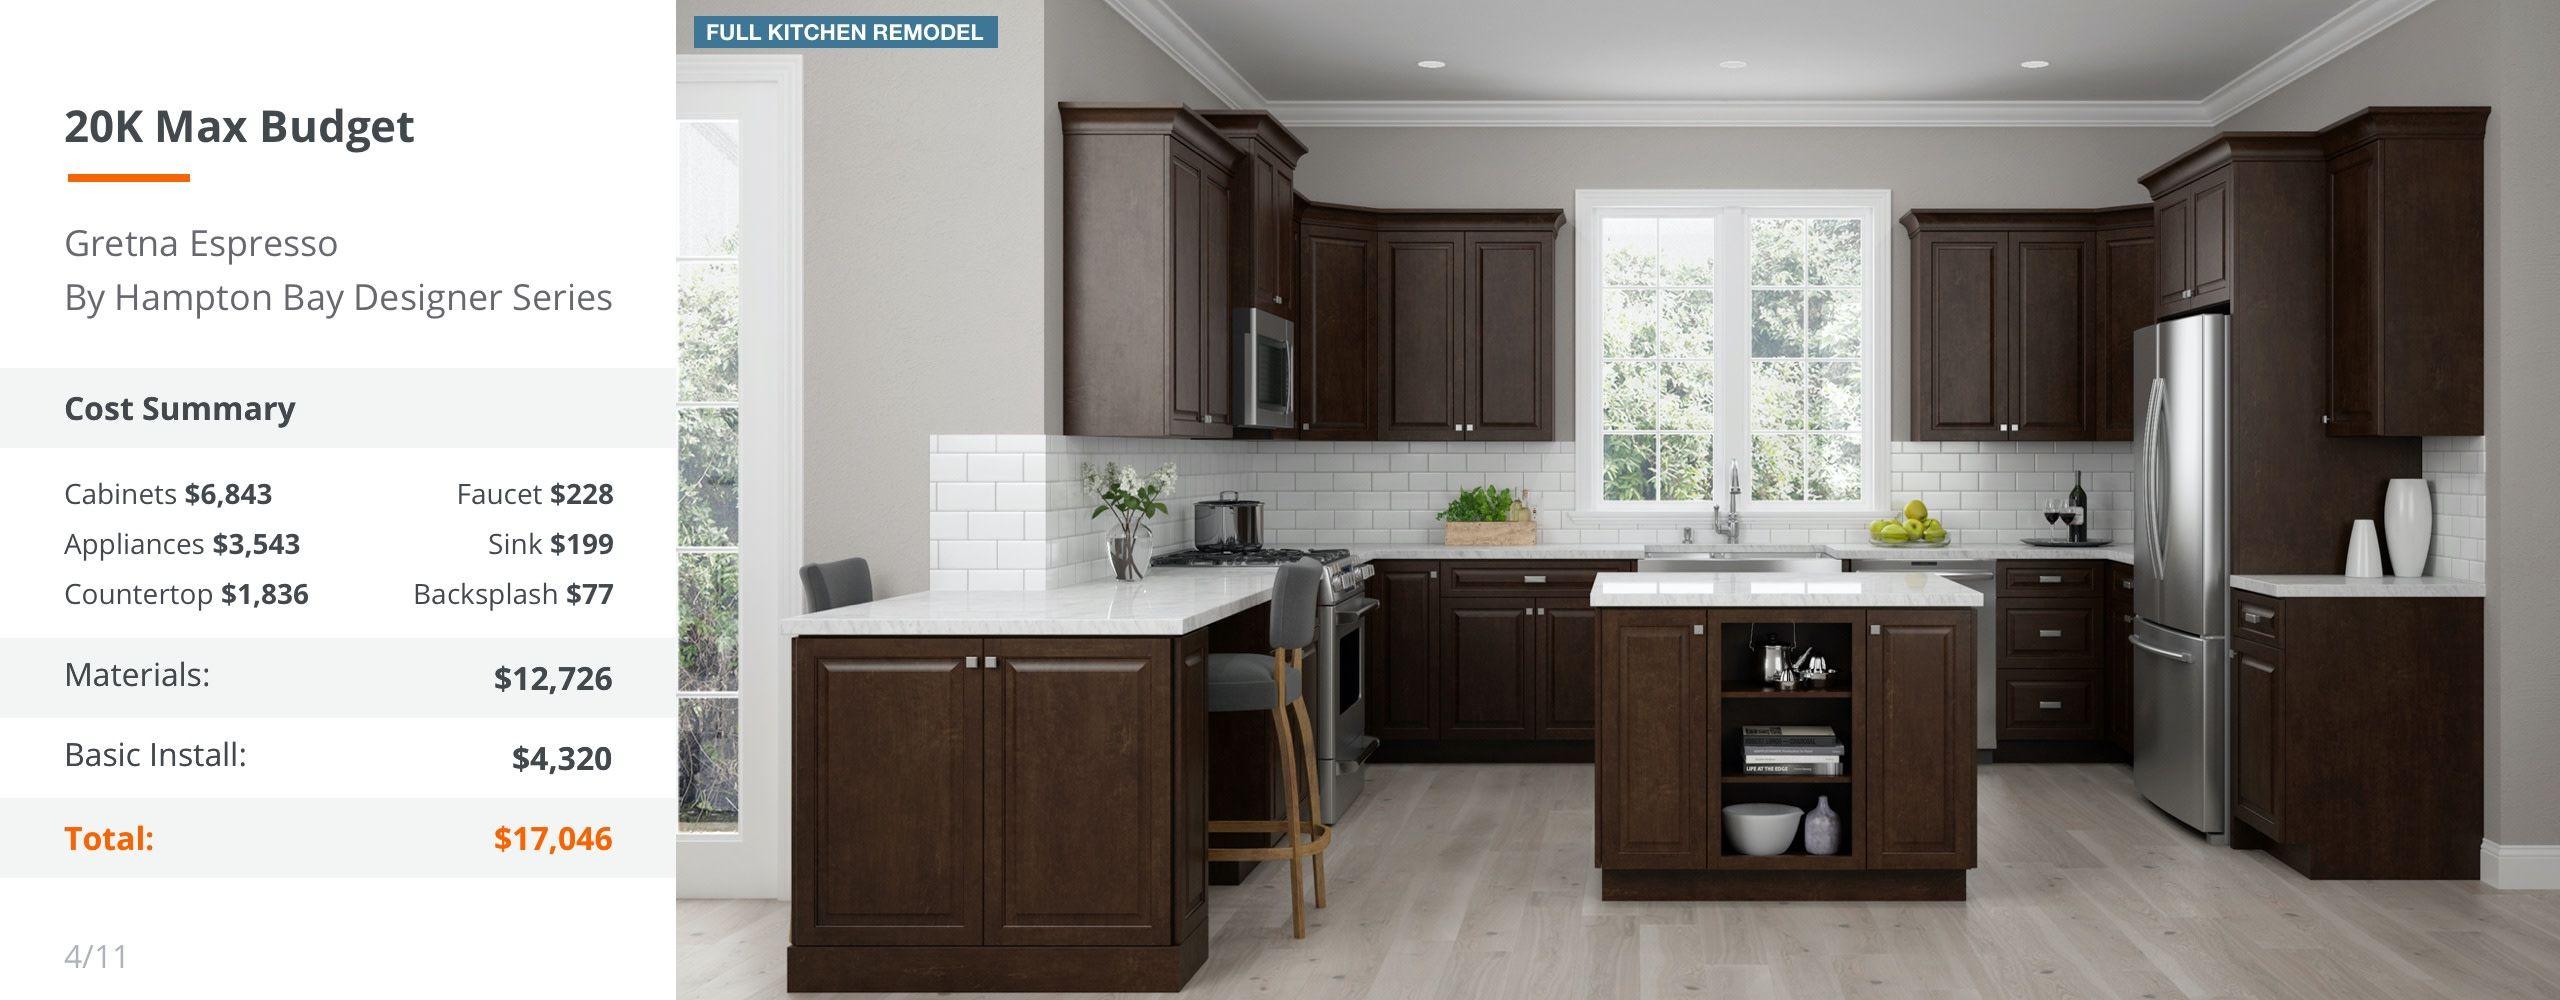 20k Max Budget Gray Desktop Kitchen Design Custom Countertops New Kitchen Cabinets